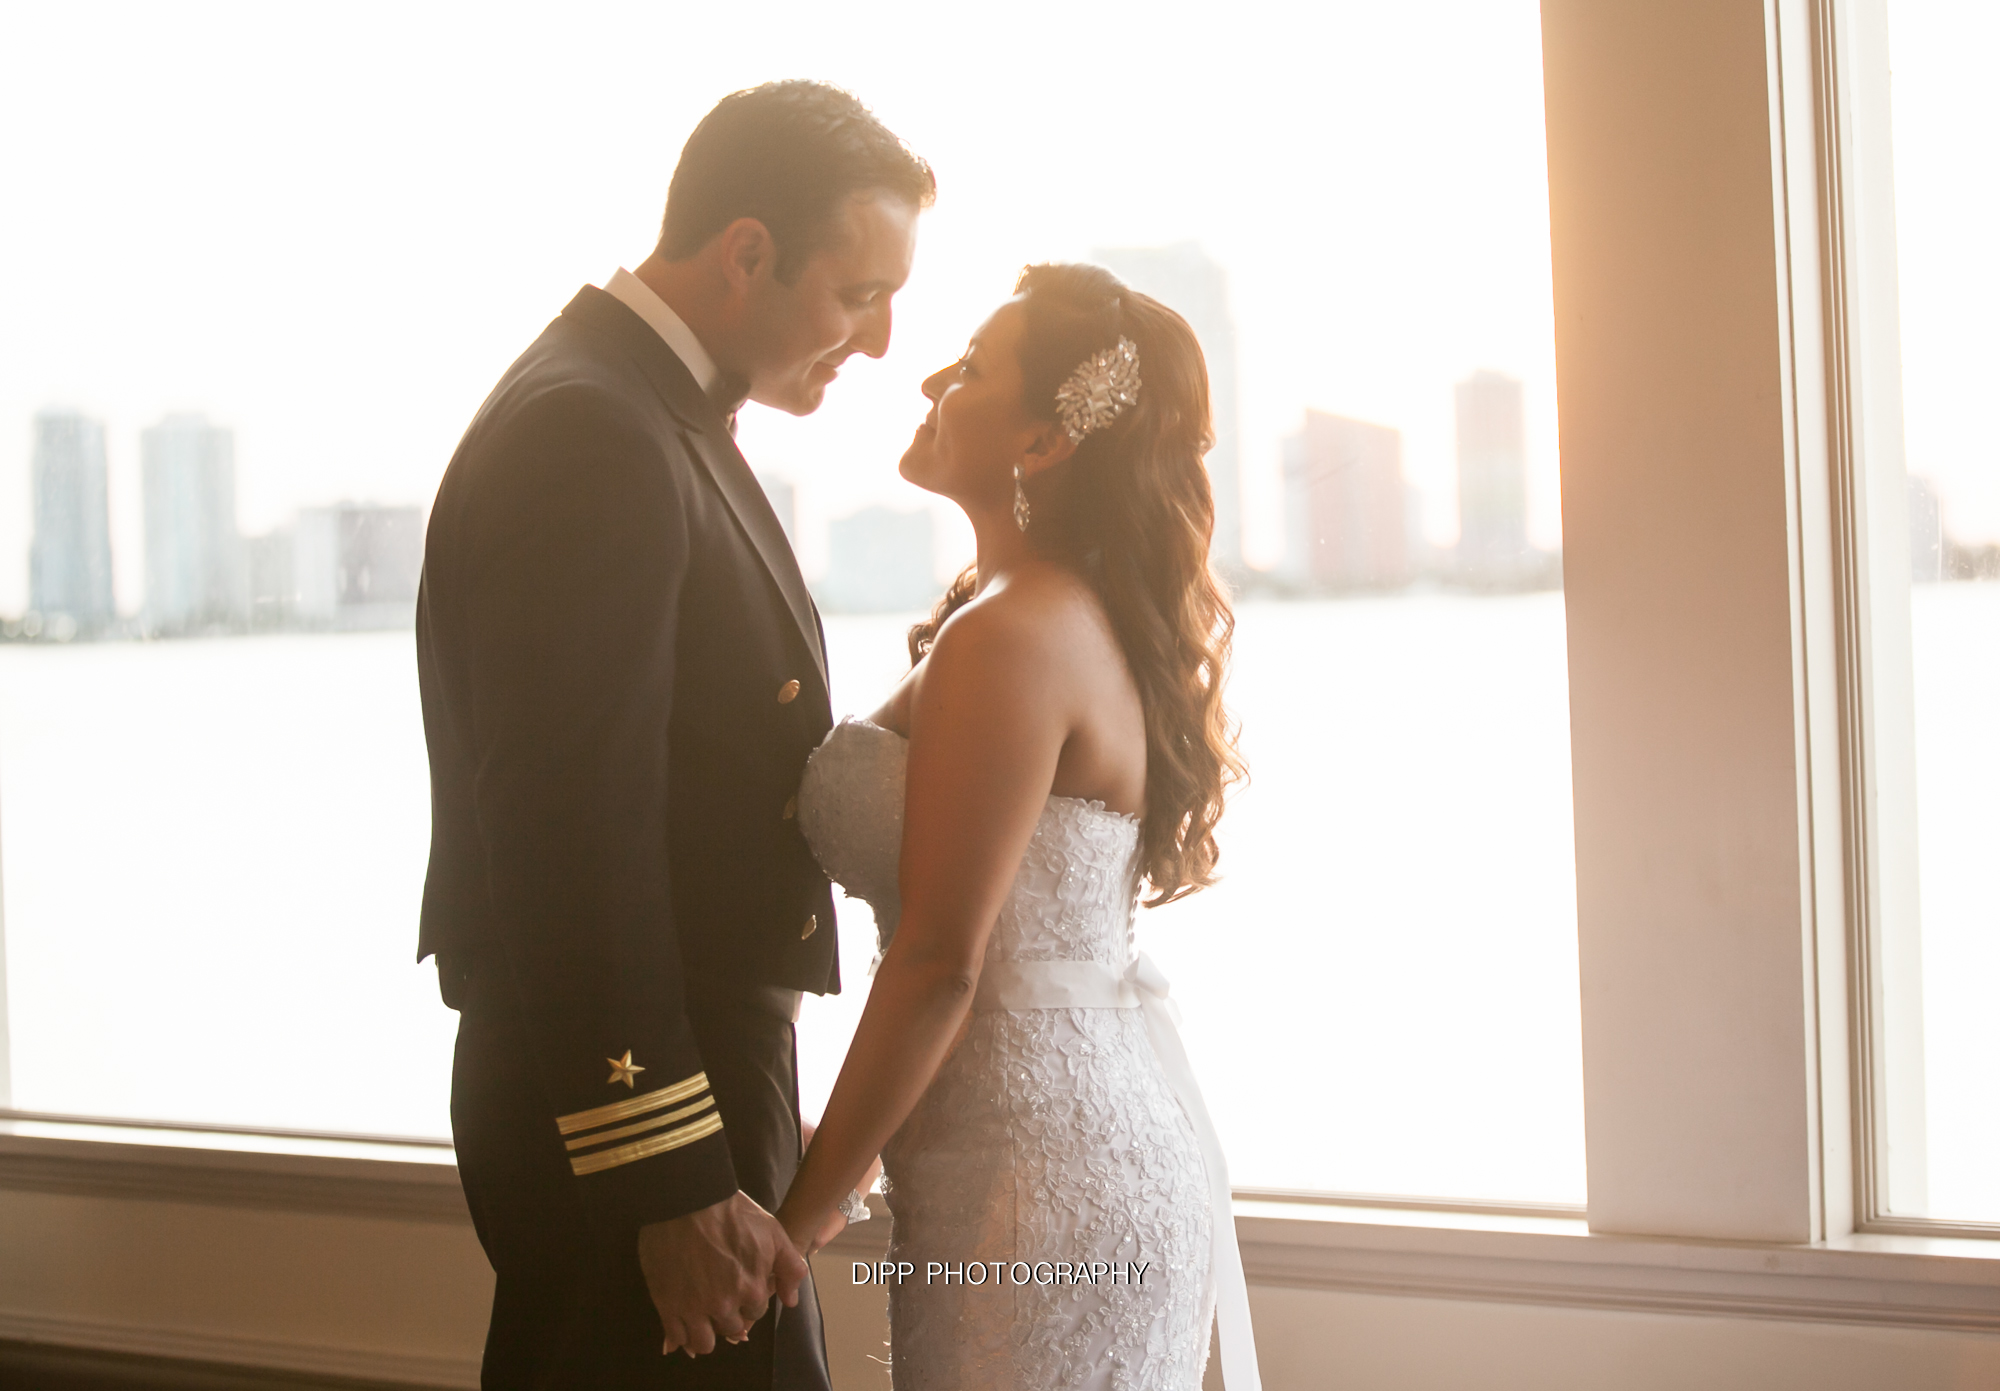 Dipp_2016 EDITED Sara & Brandon Wedding-301